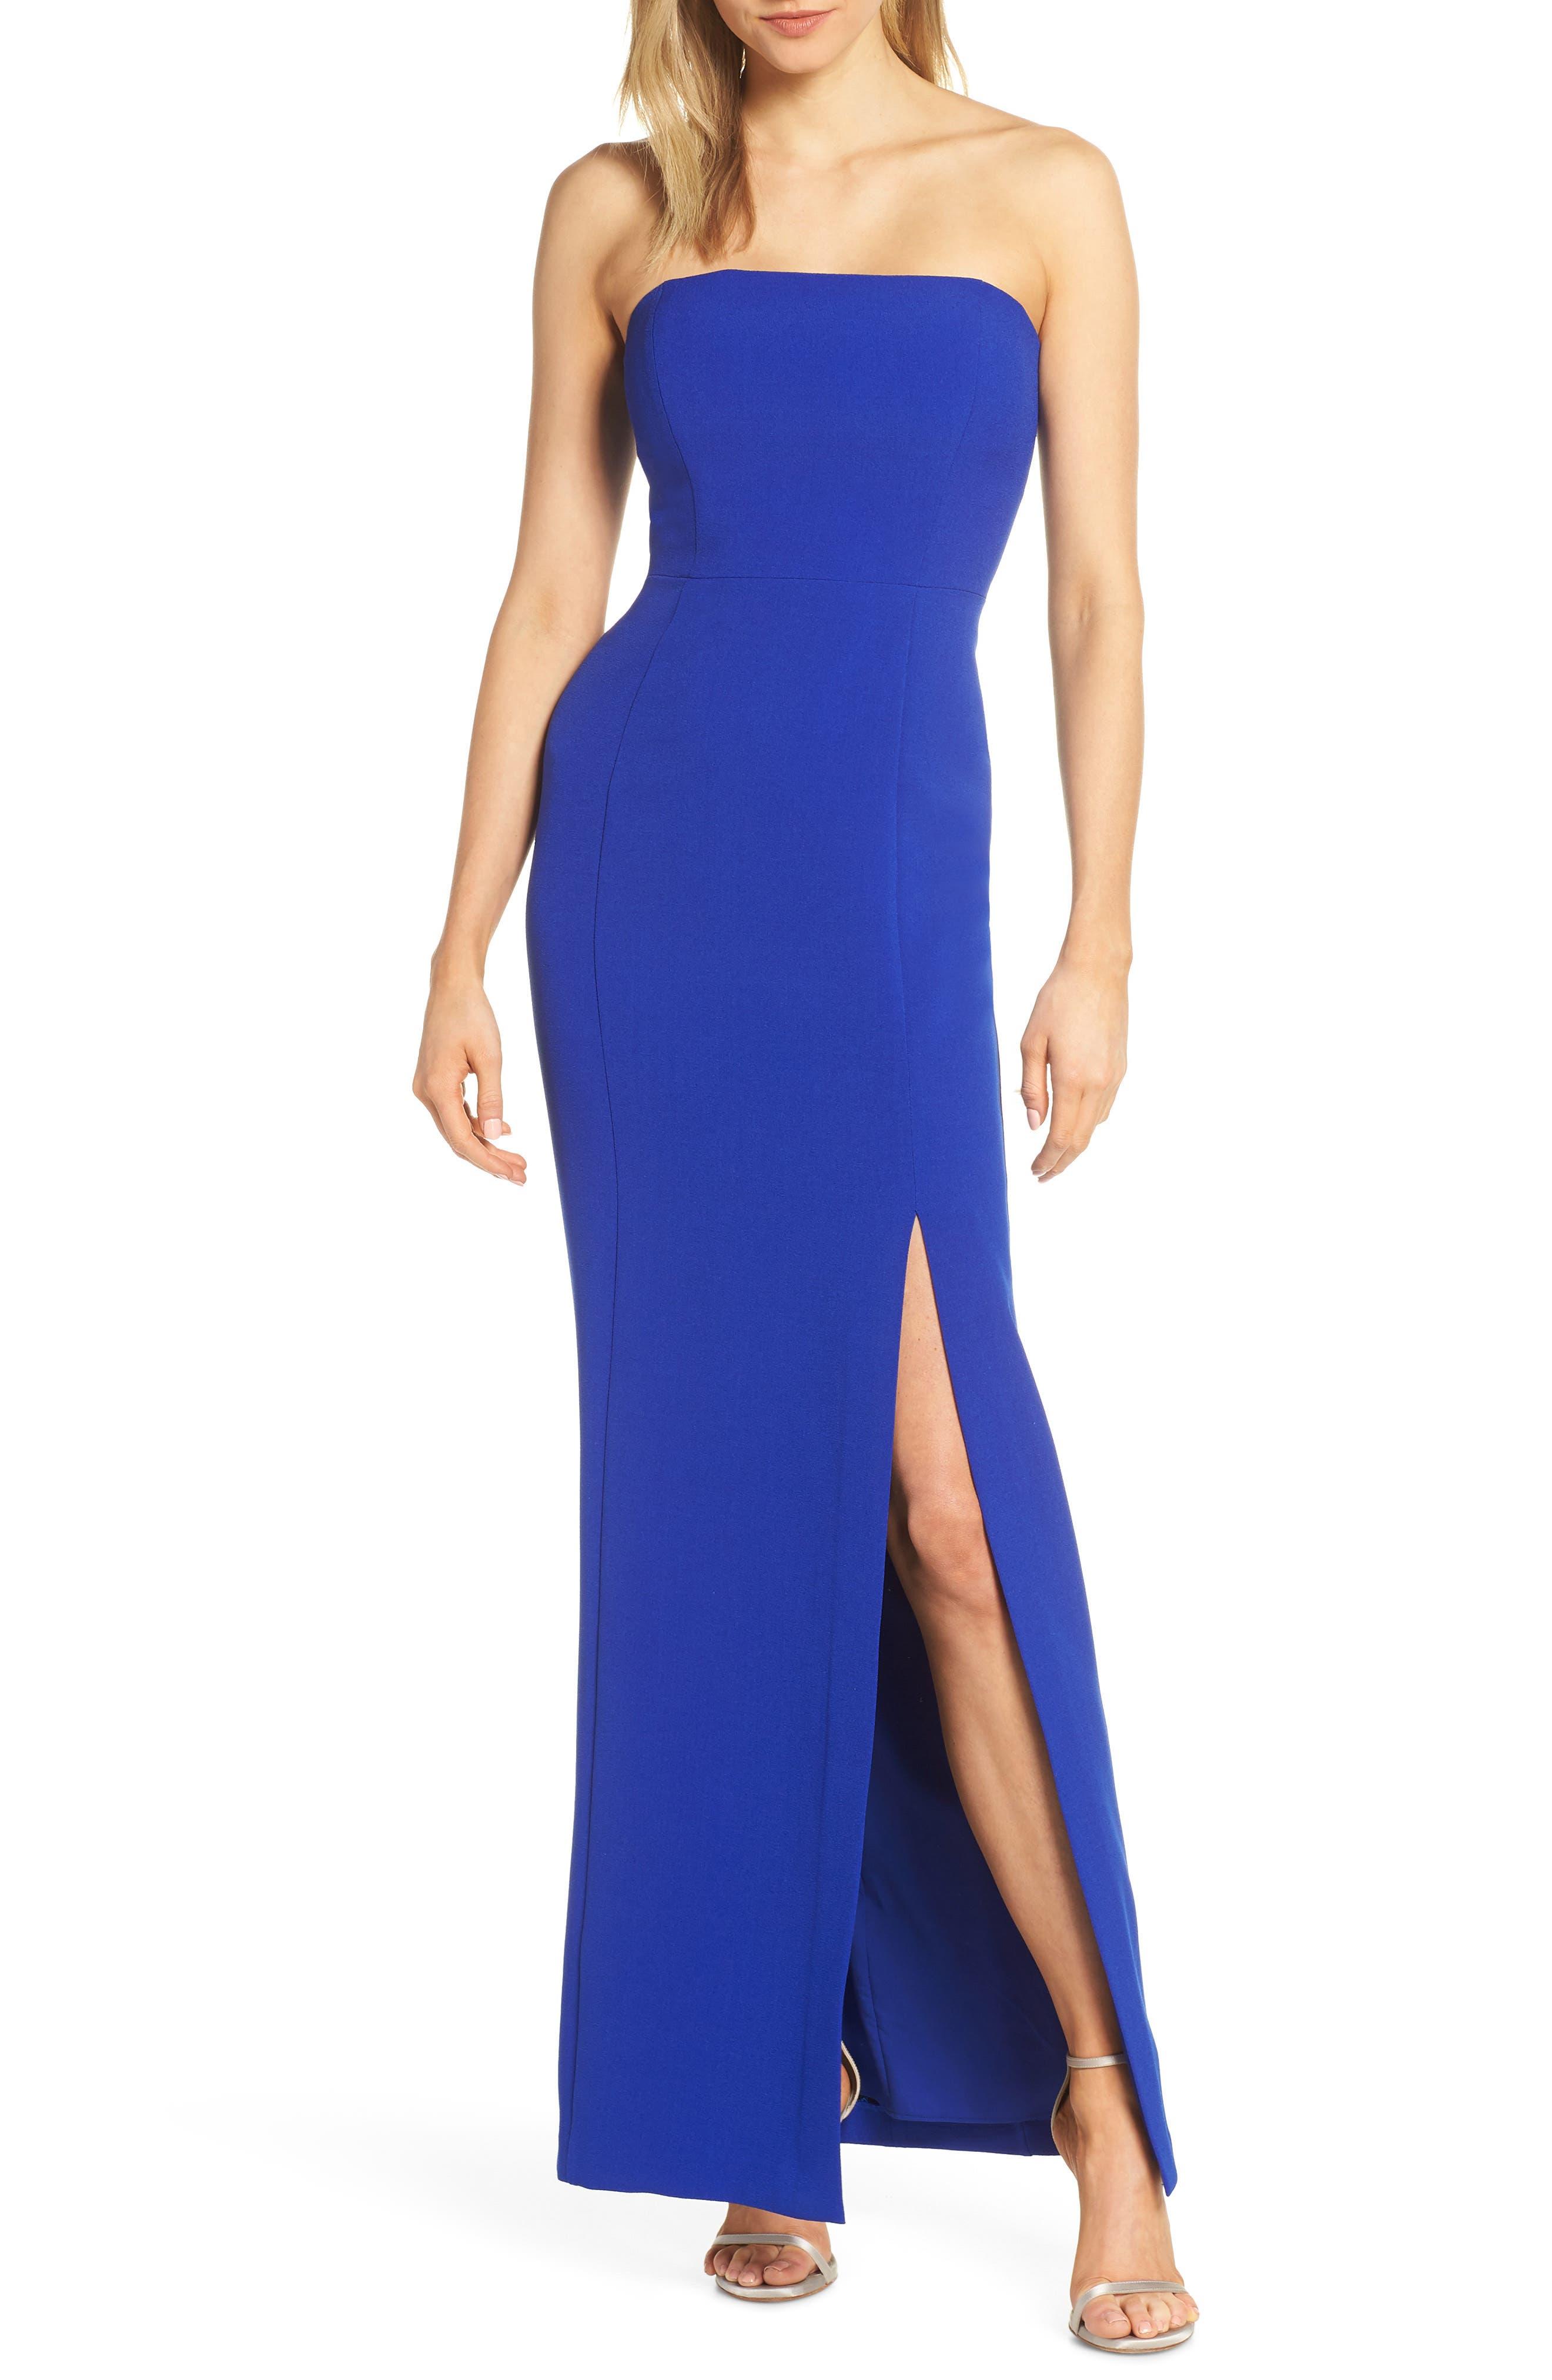 Eliza J Strapless Crepe Evening Dress, Blue